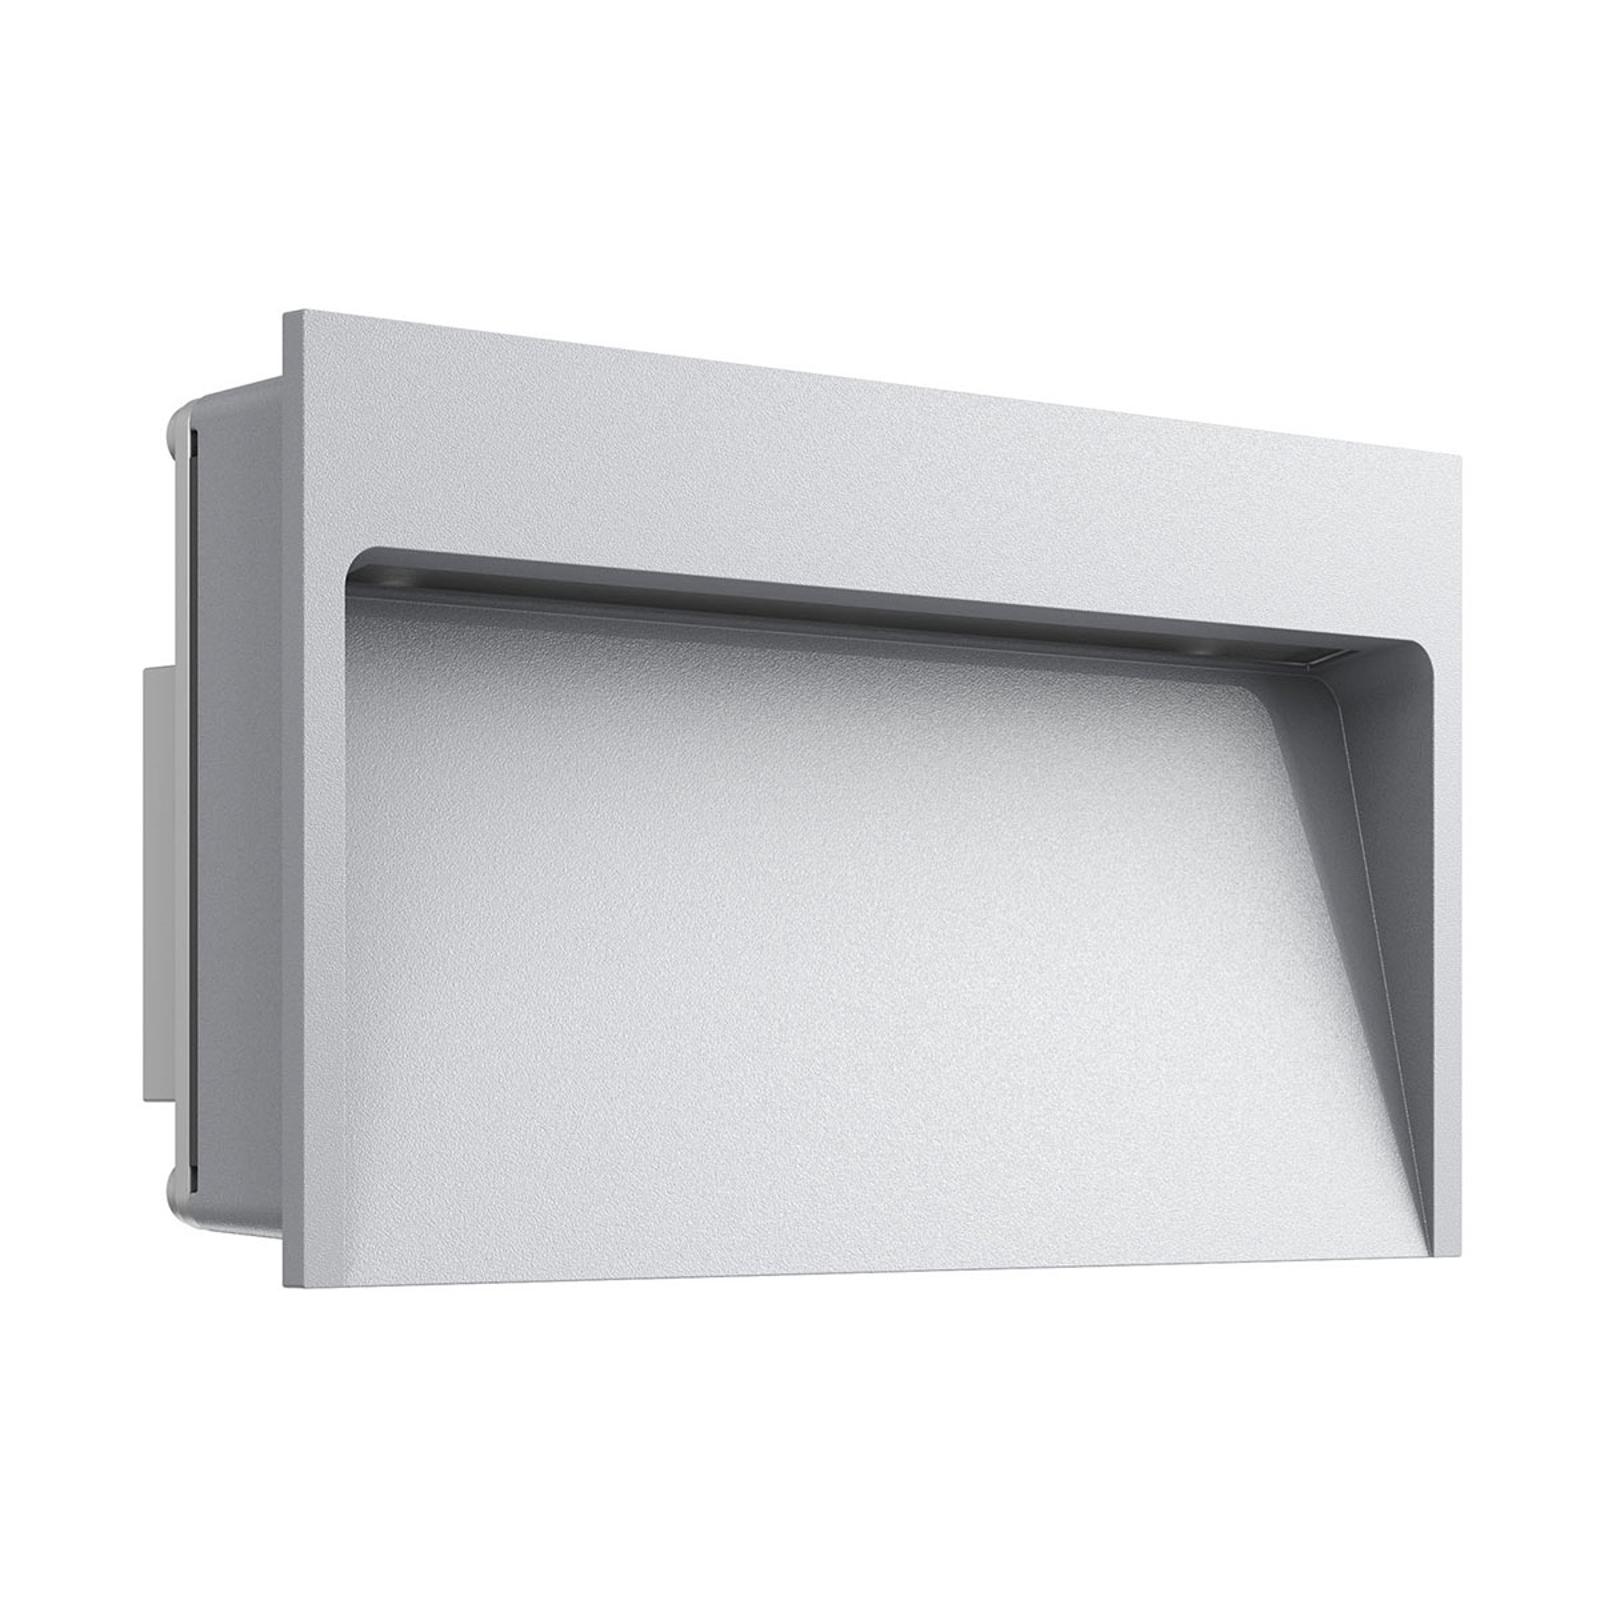 FLOS My Way - breite LED-Wandeinbauleuchte, grau